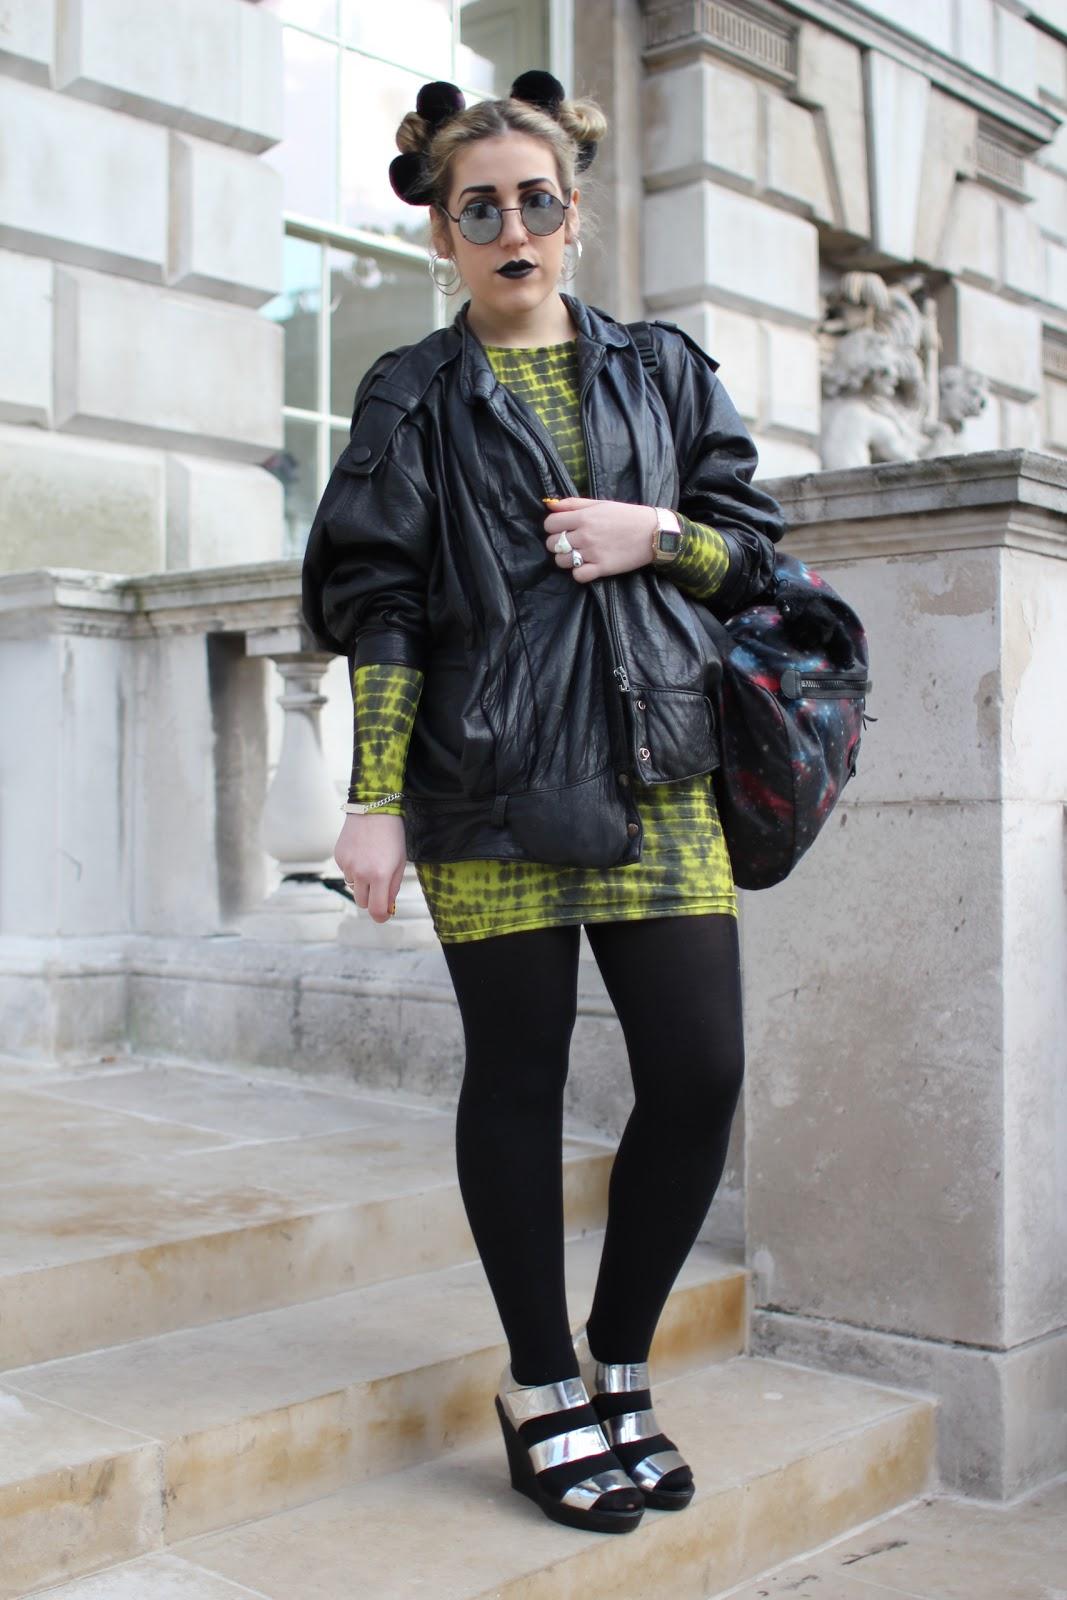 Styleeast London Fashion Week Street Style Gaga Ooh La La